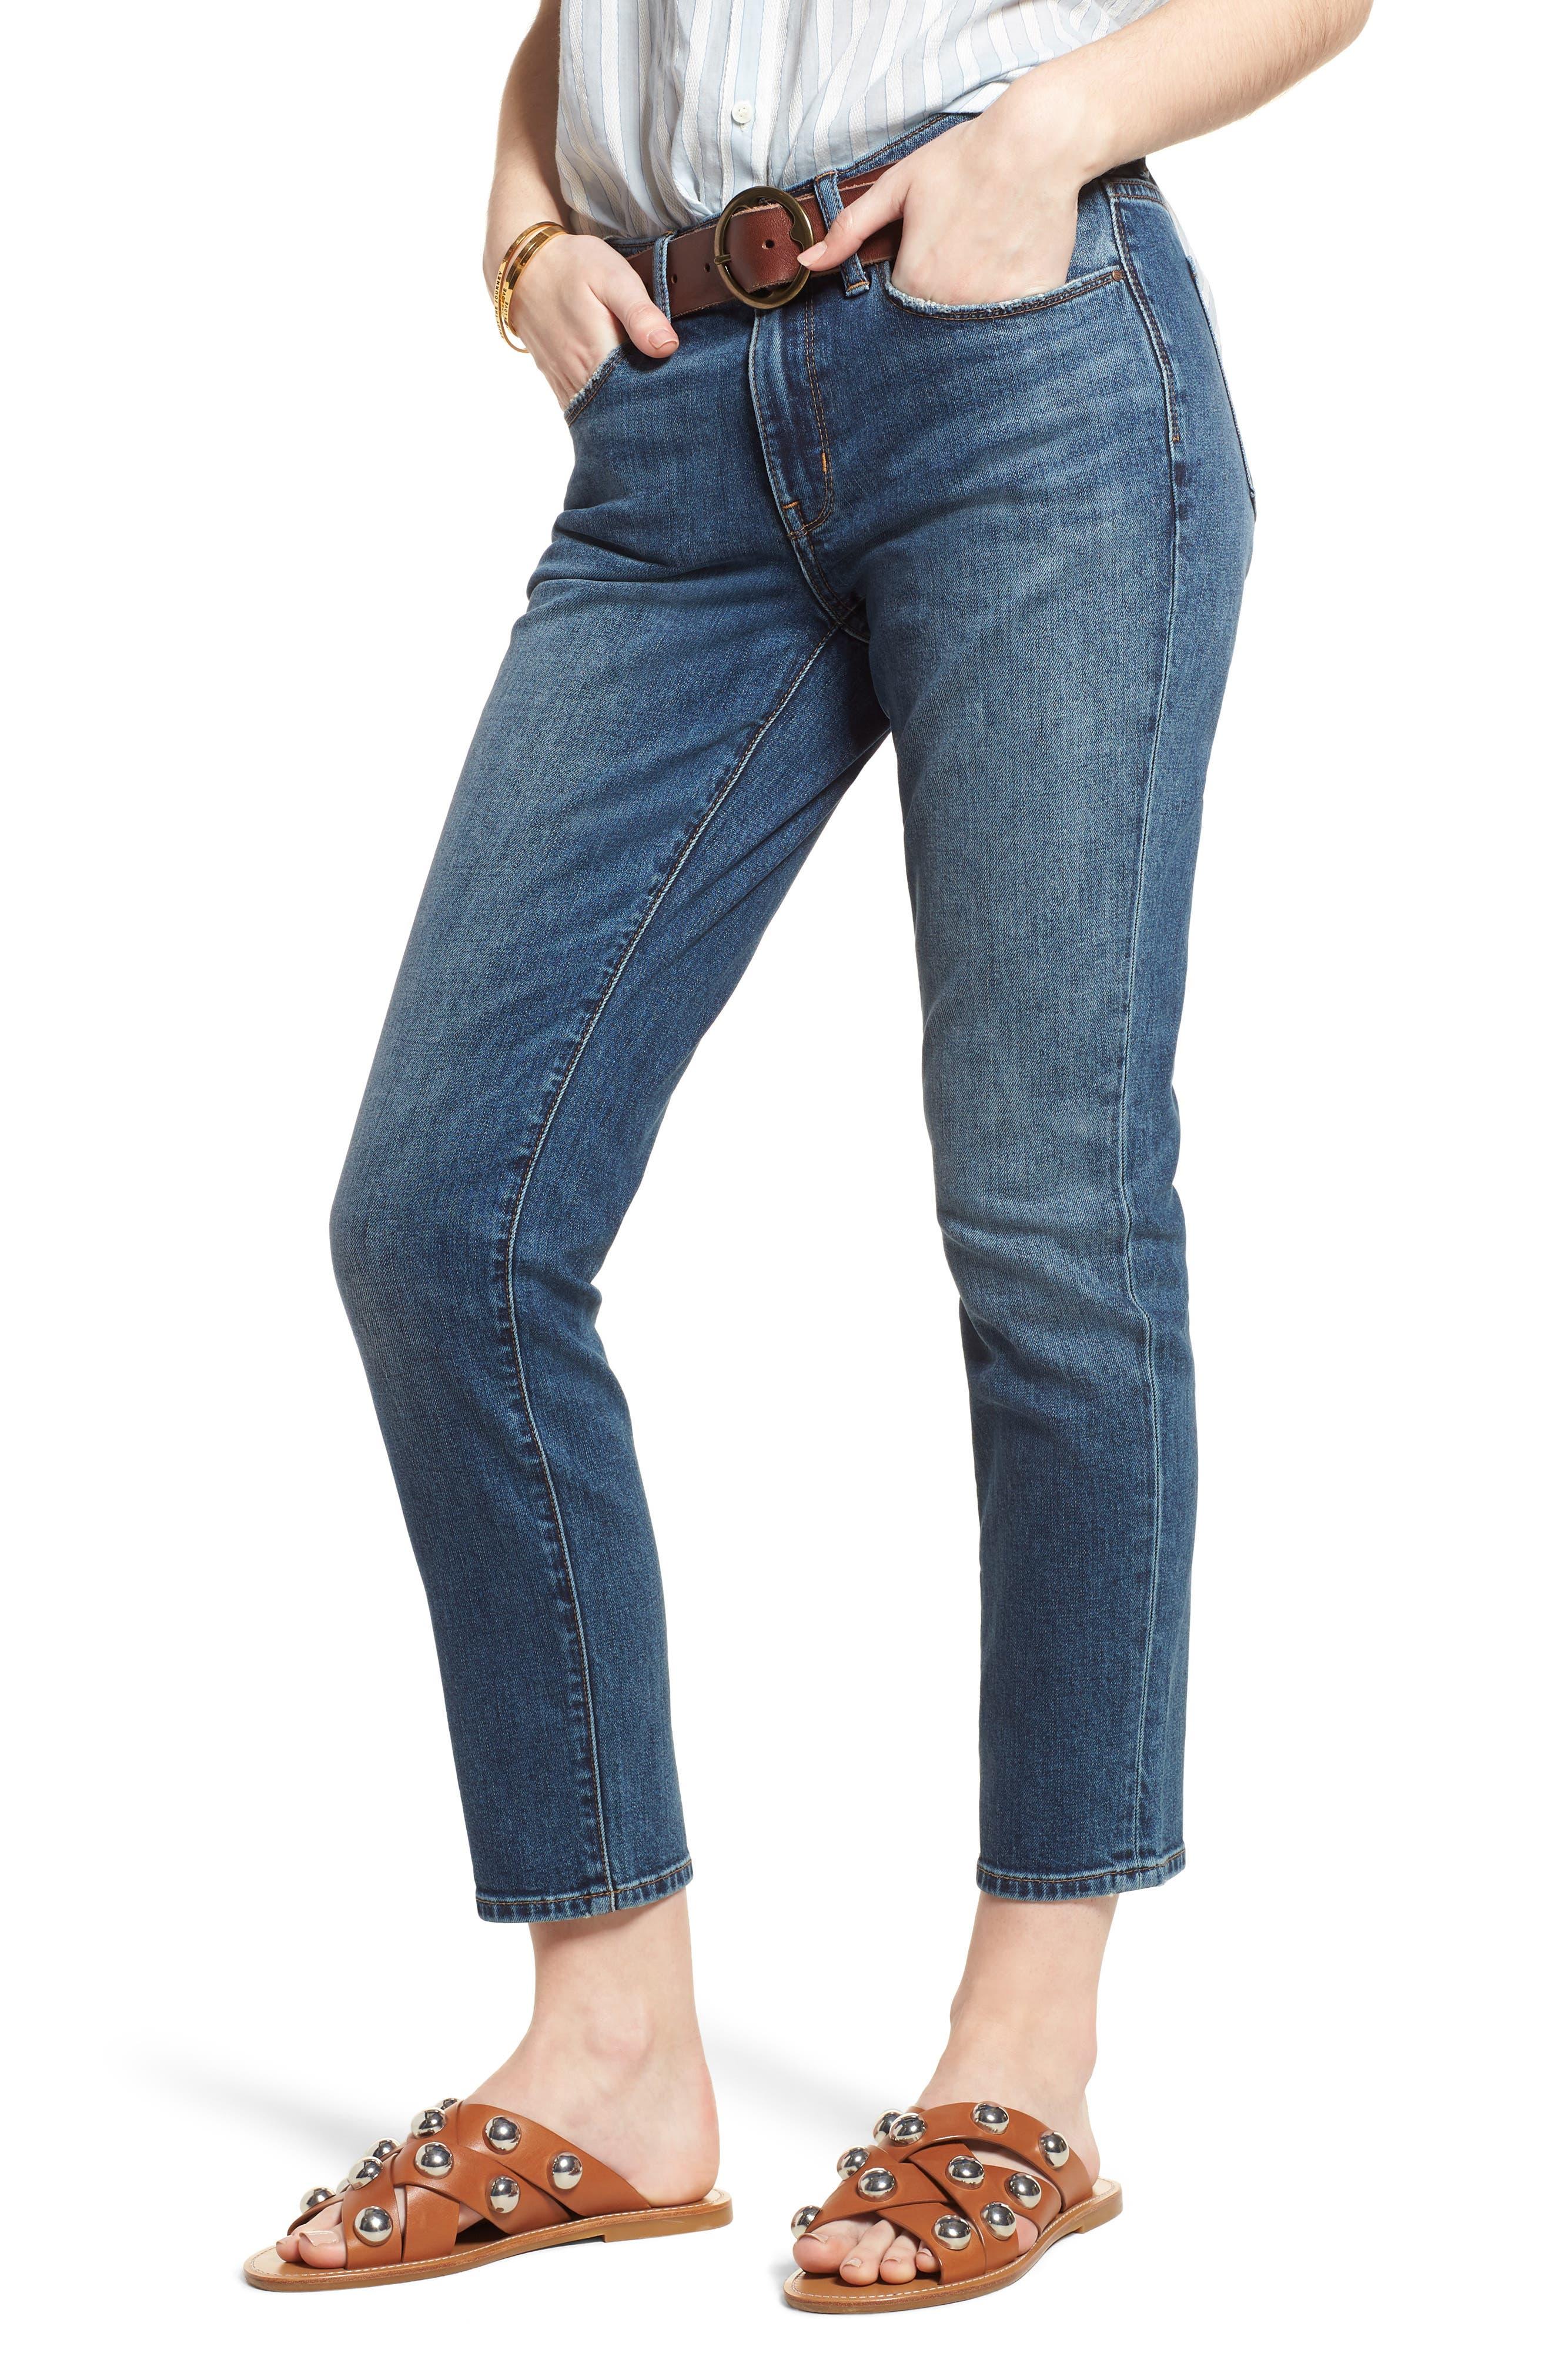 Main Image - Treasure & Bond Grant Ankle Boyfriend Jeans (Gravel Dusk Vintage)